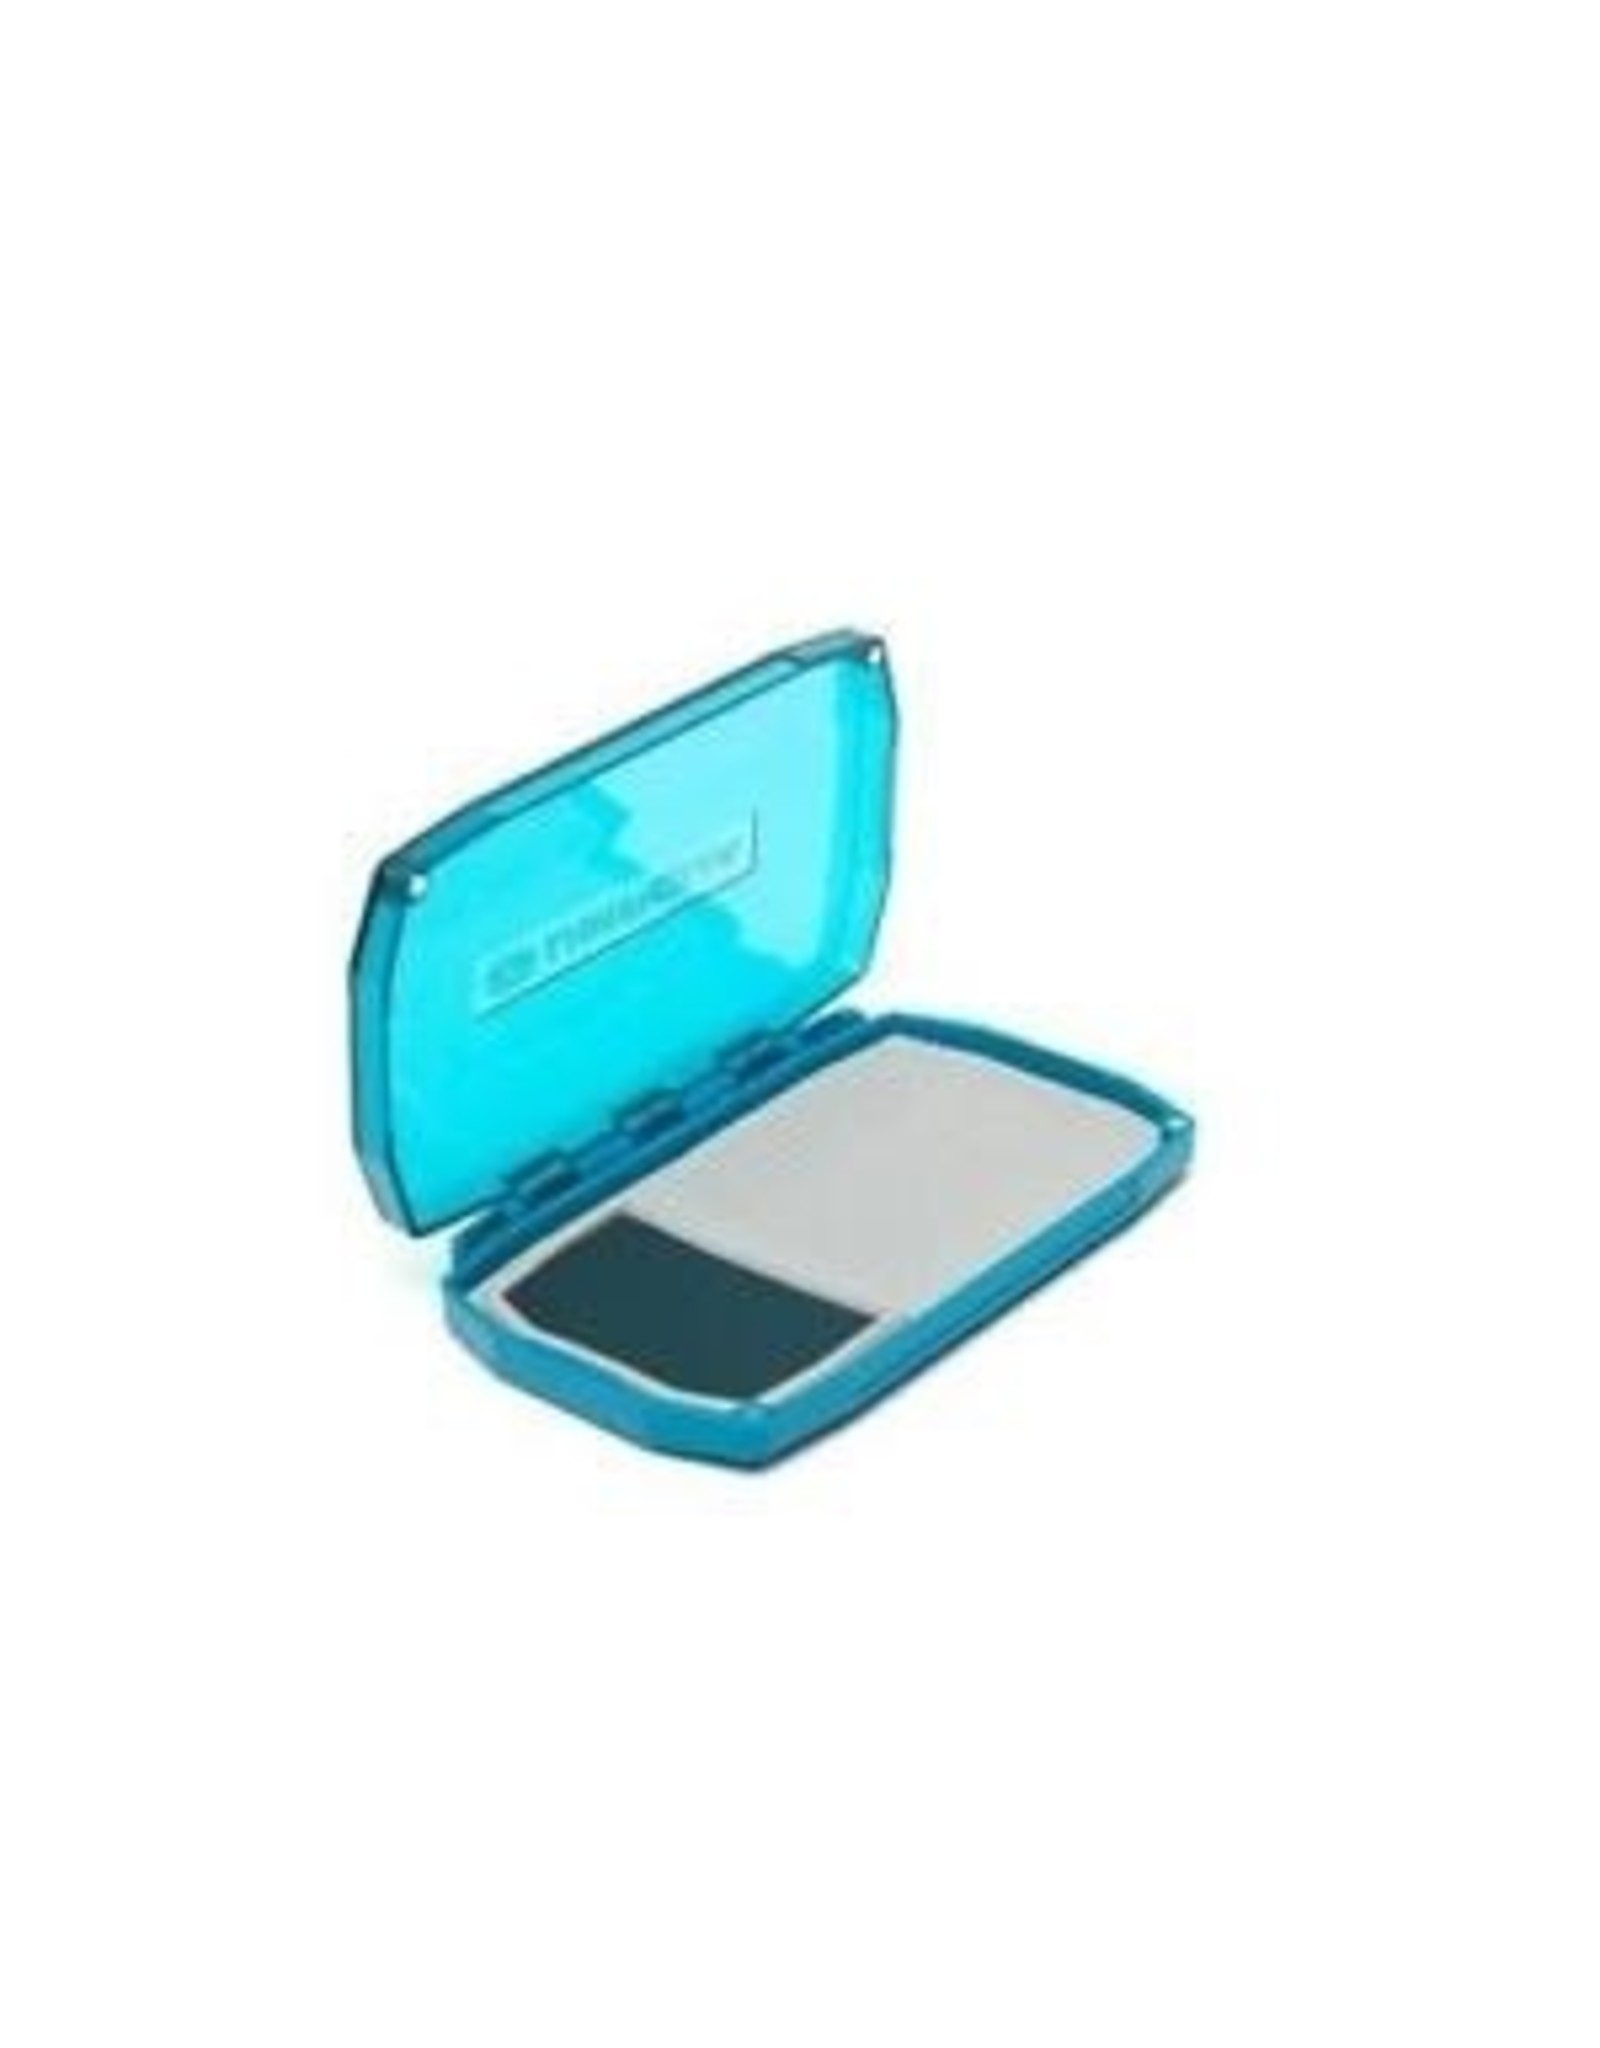 Umpqua Umpqua UPG LT Box Mini Mag Midge Blue